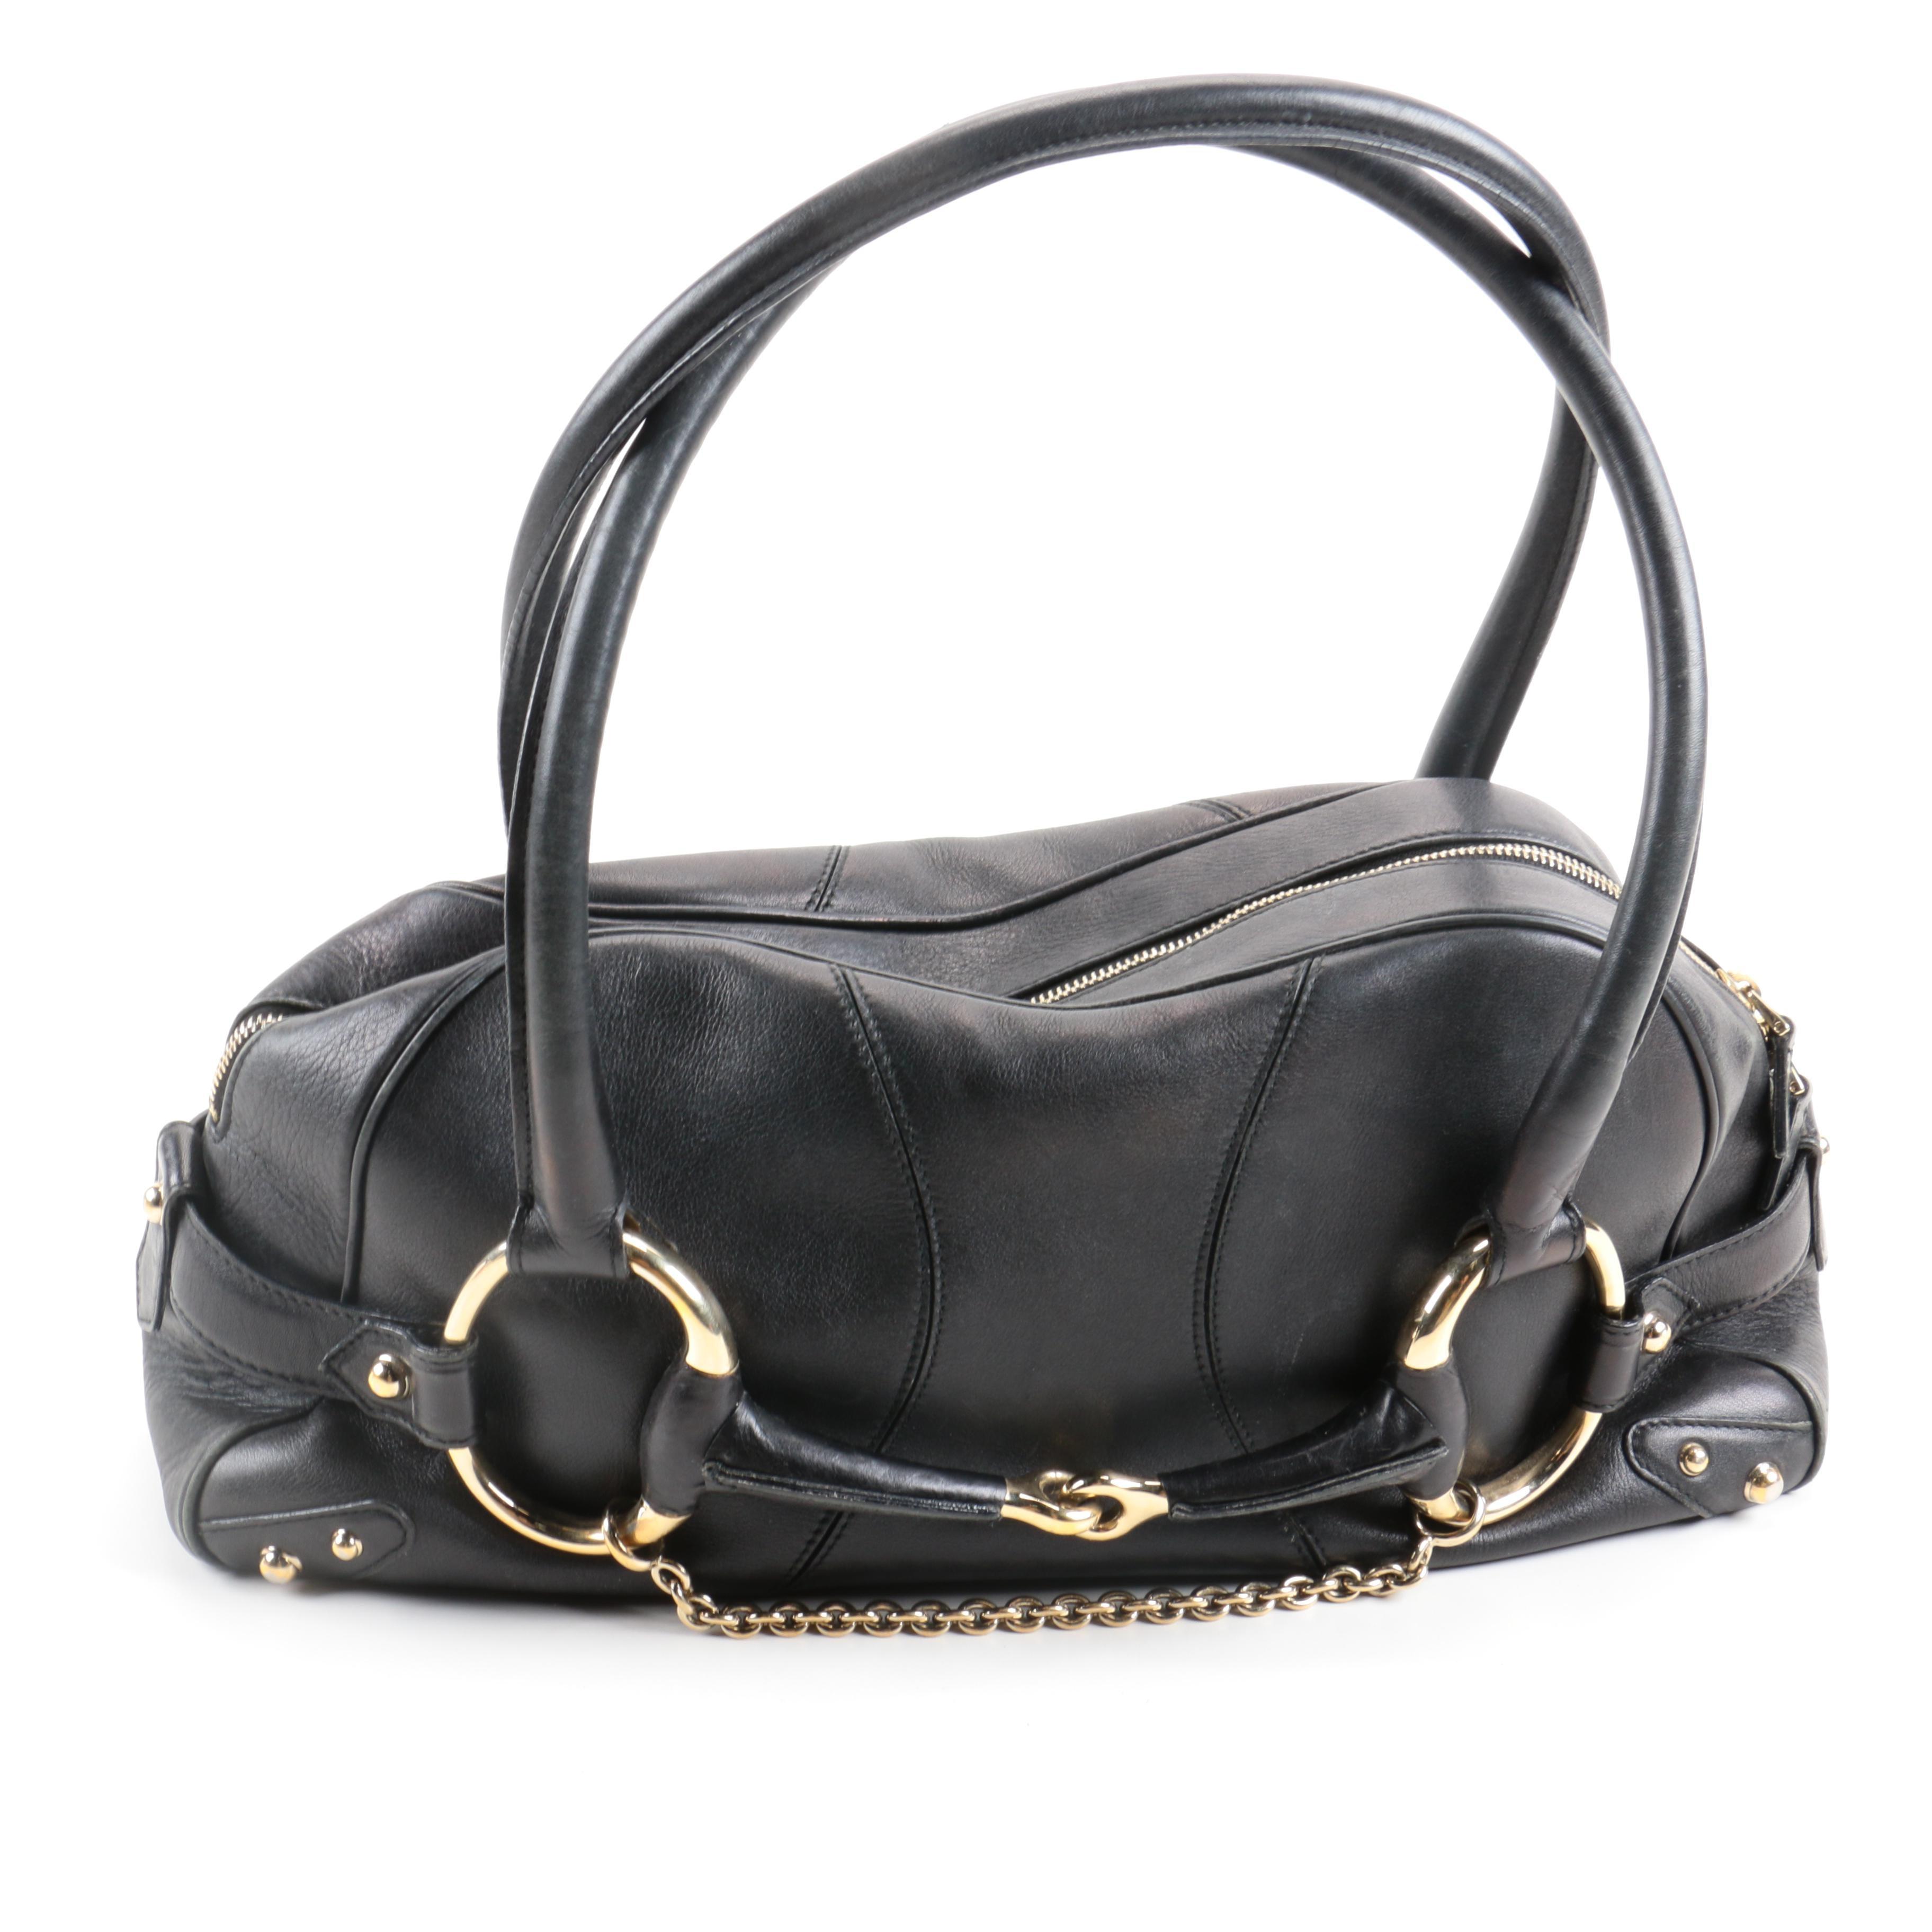 Gucci Leather Satchel